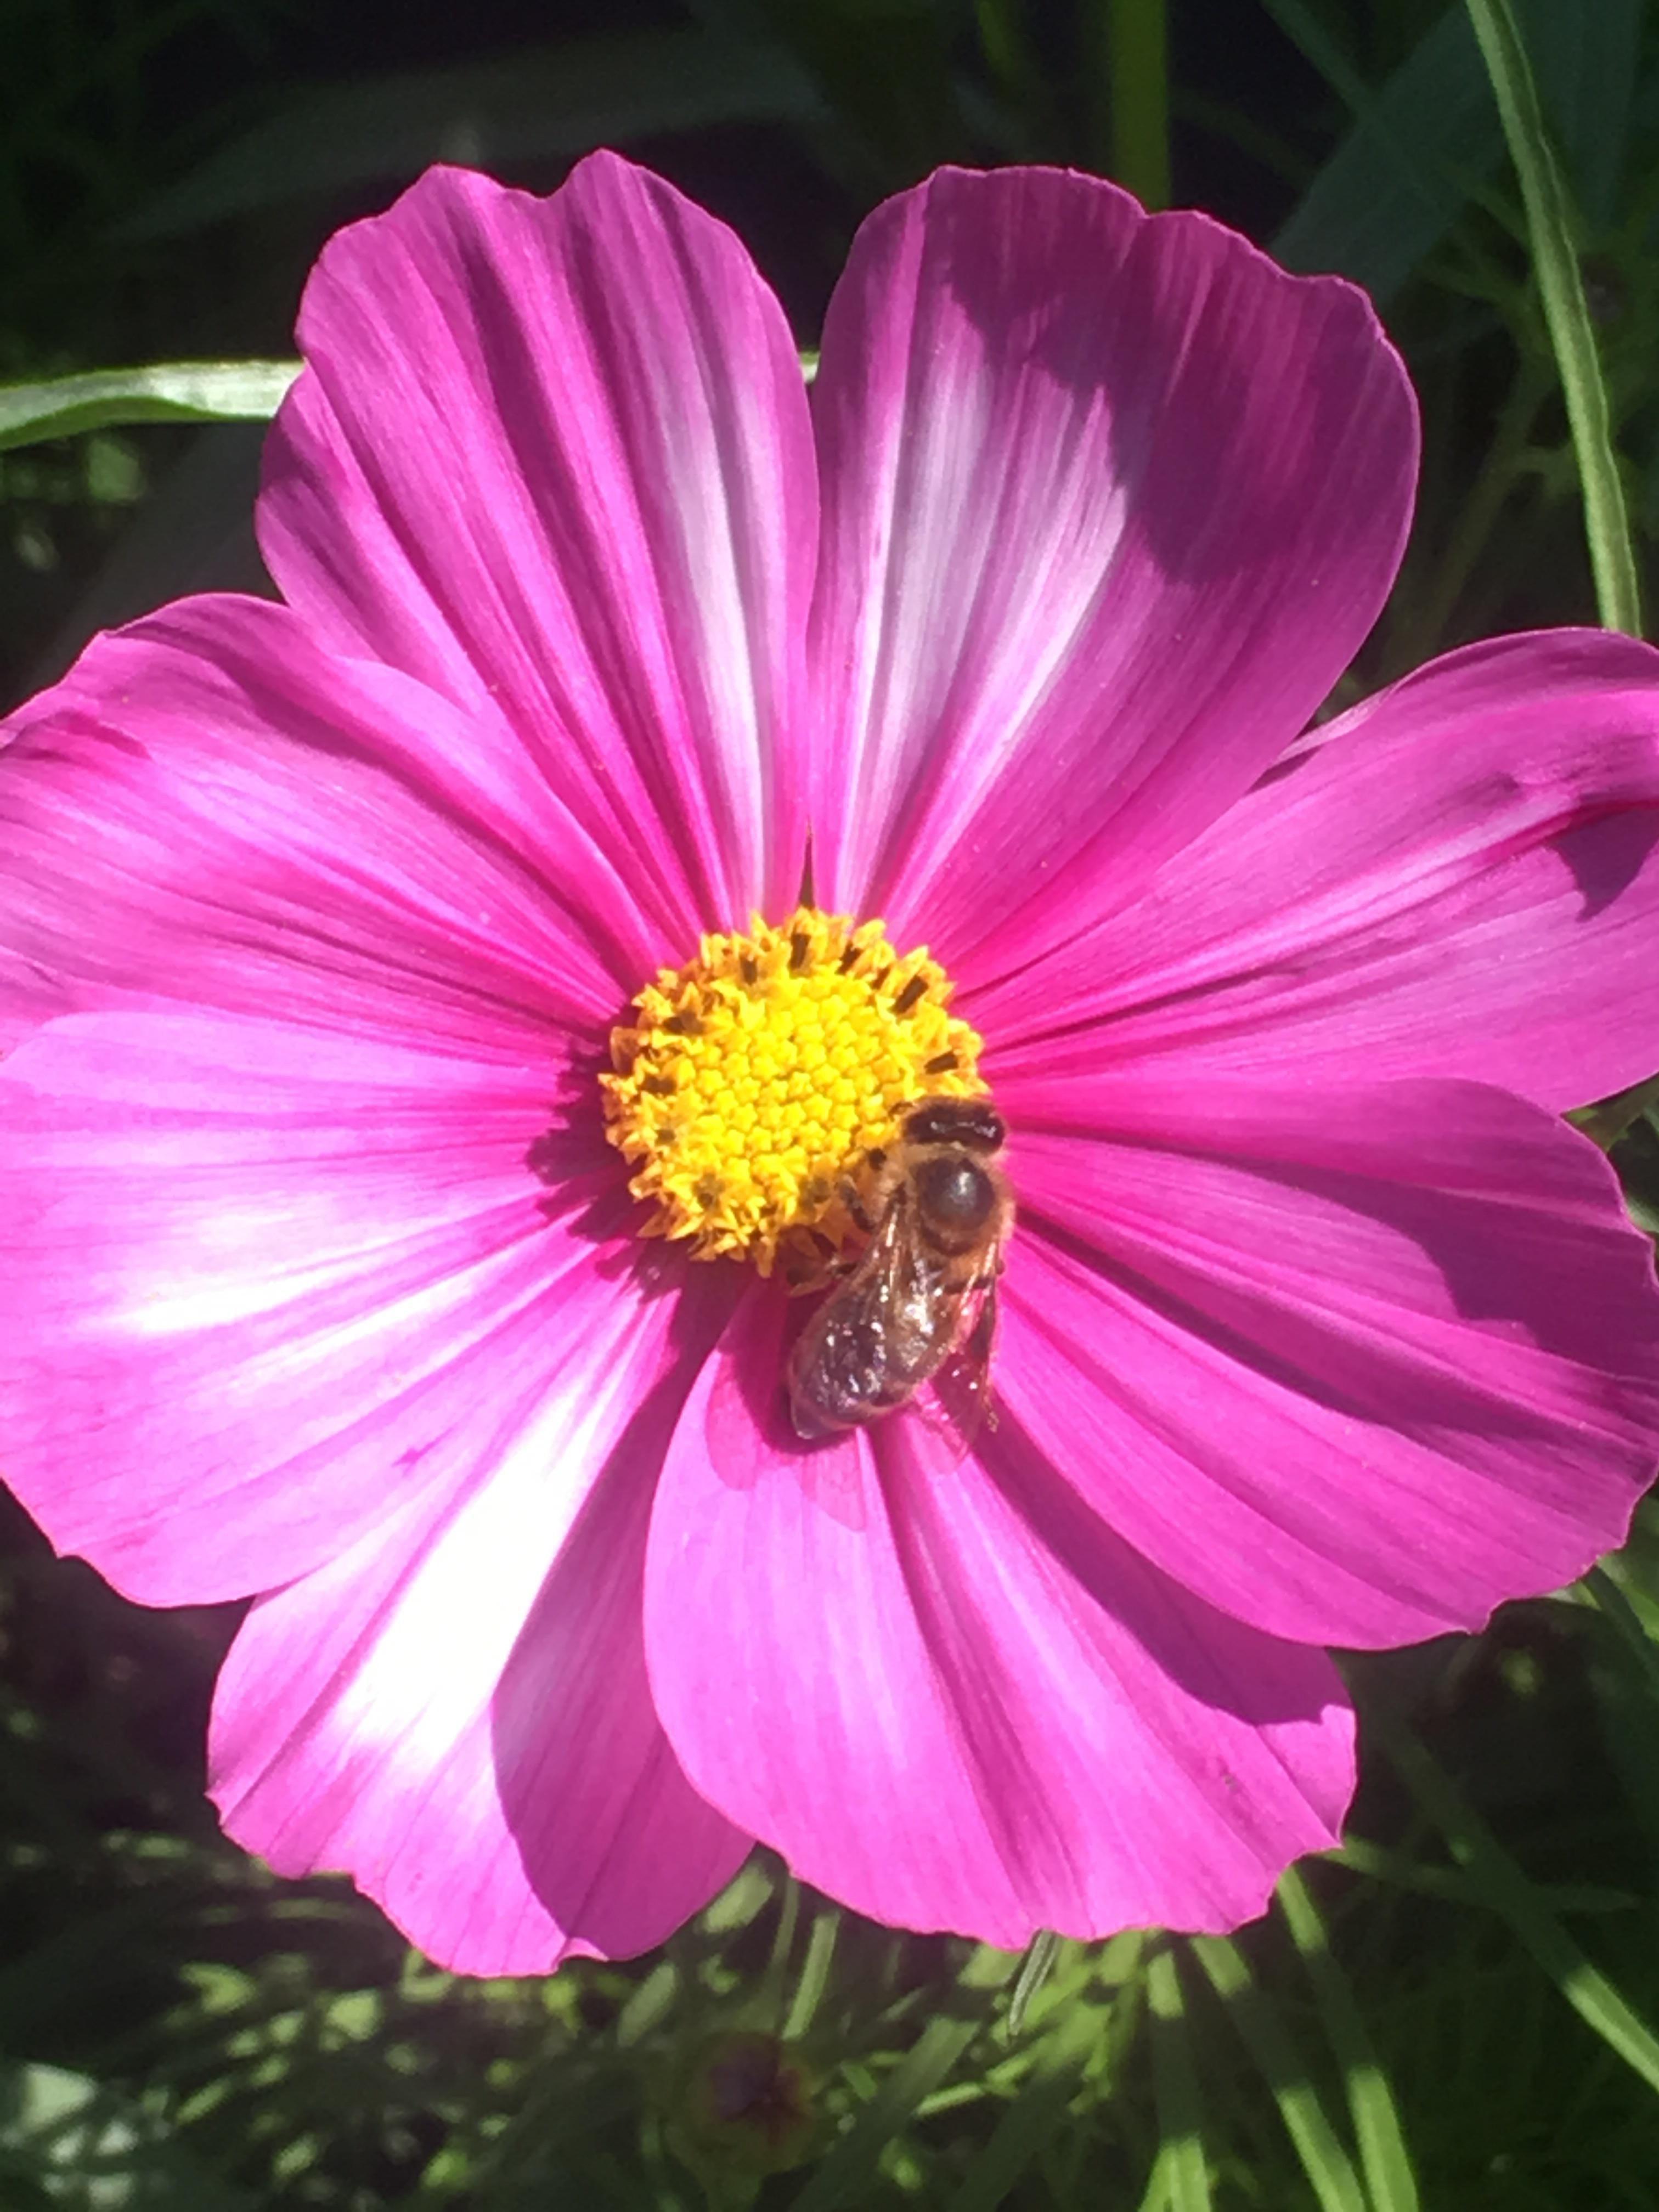 Oh how i love bees gardening garden diy home flowers